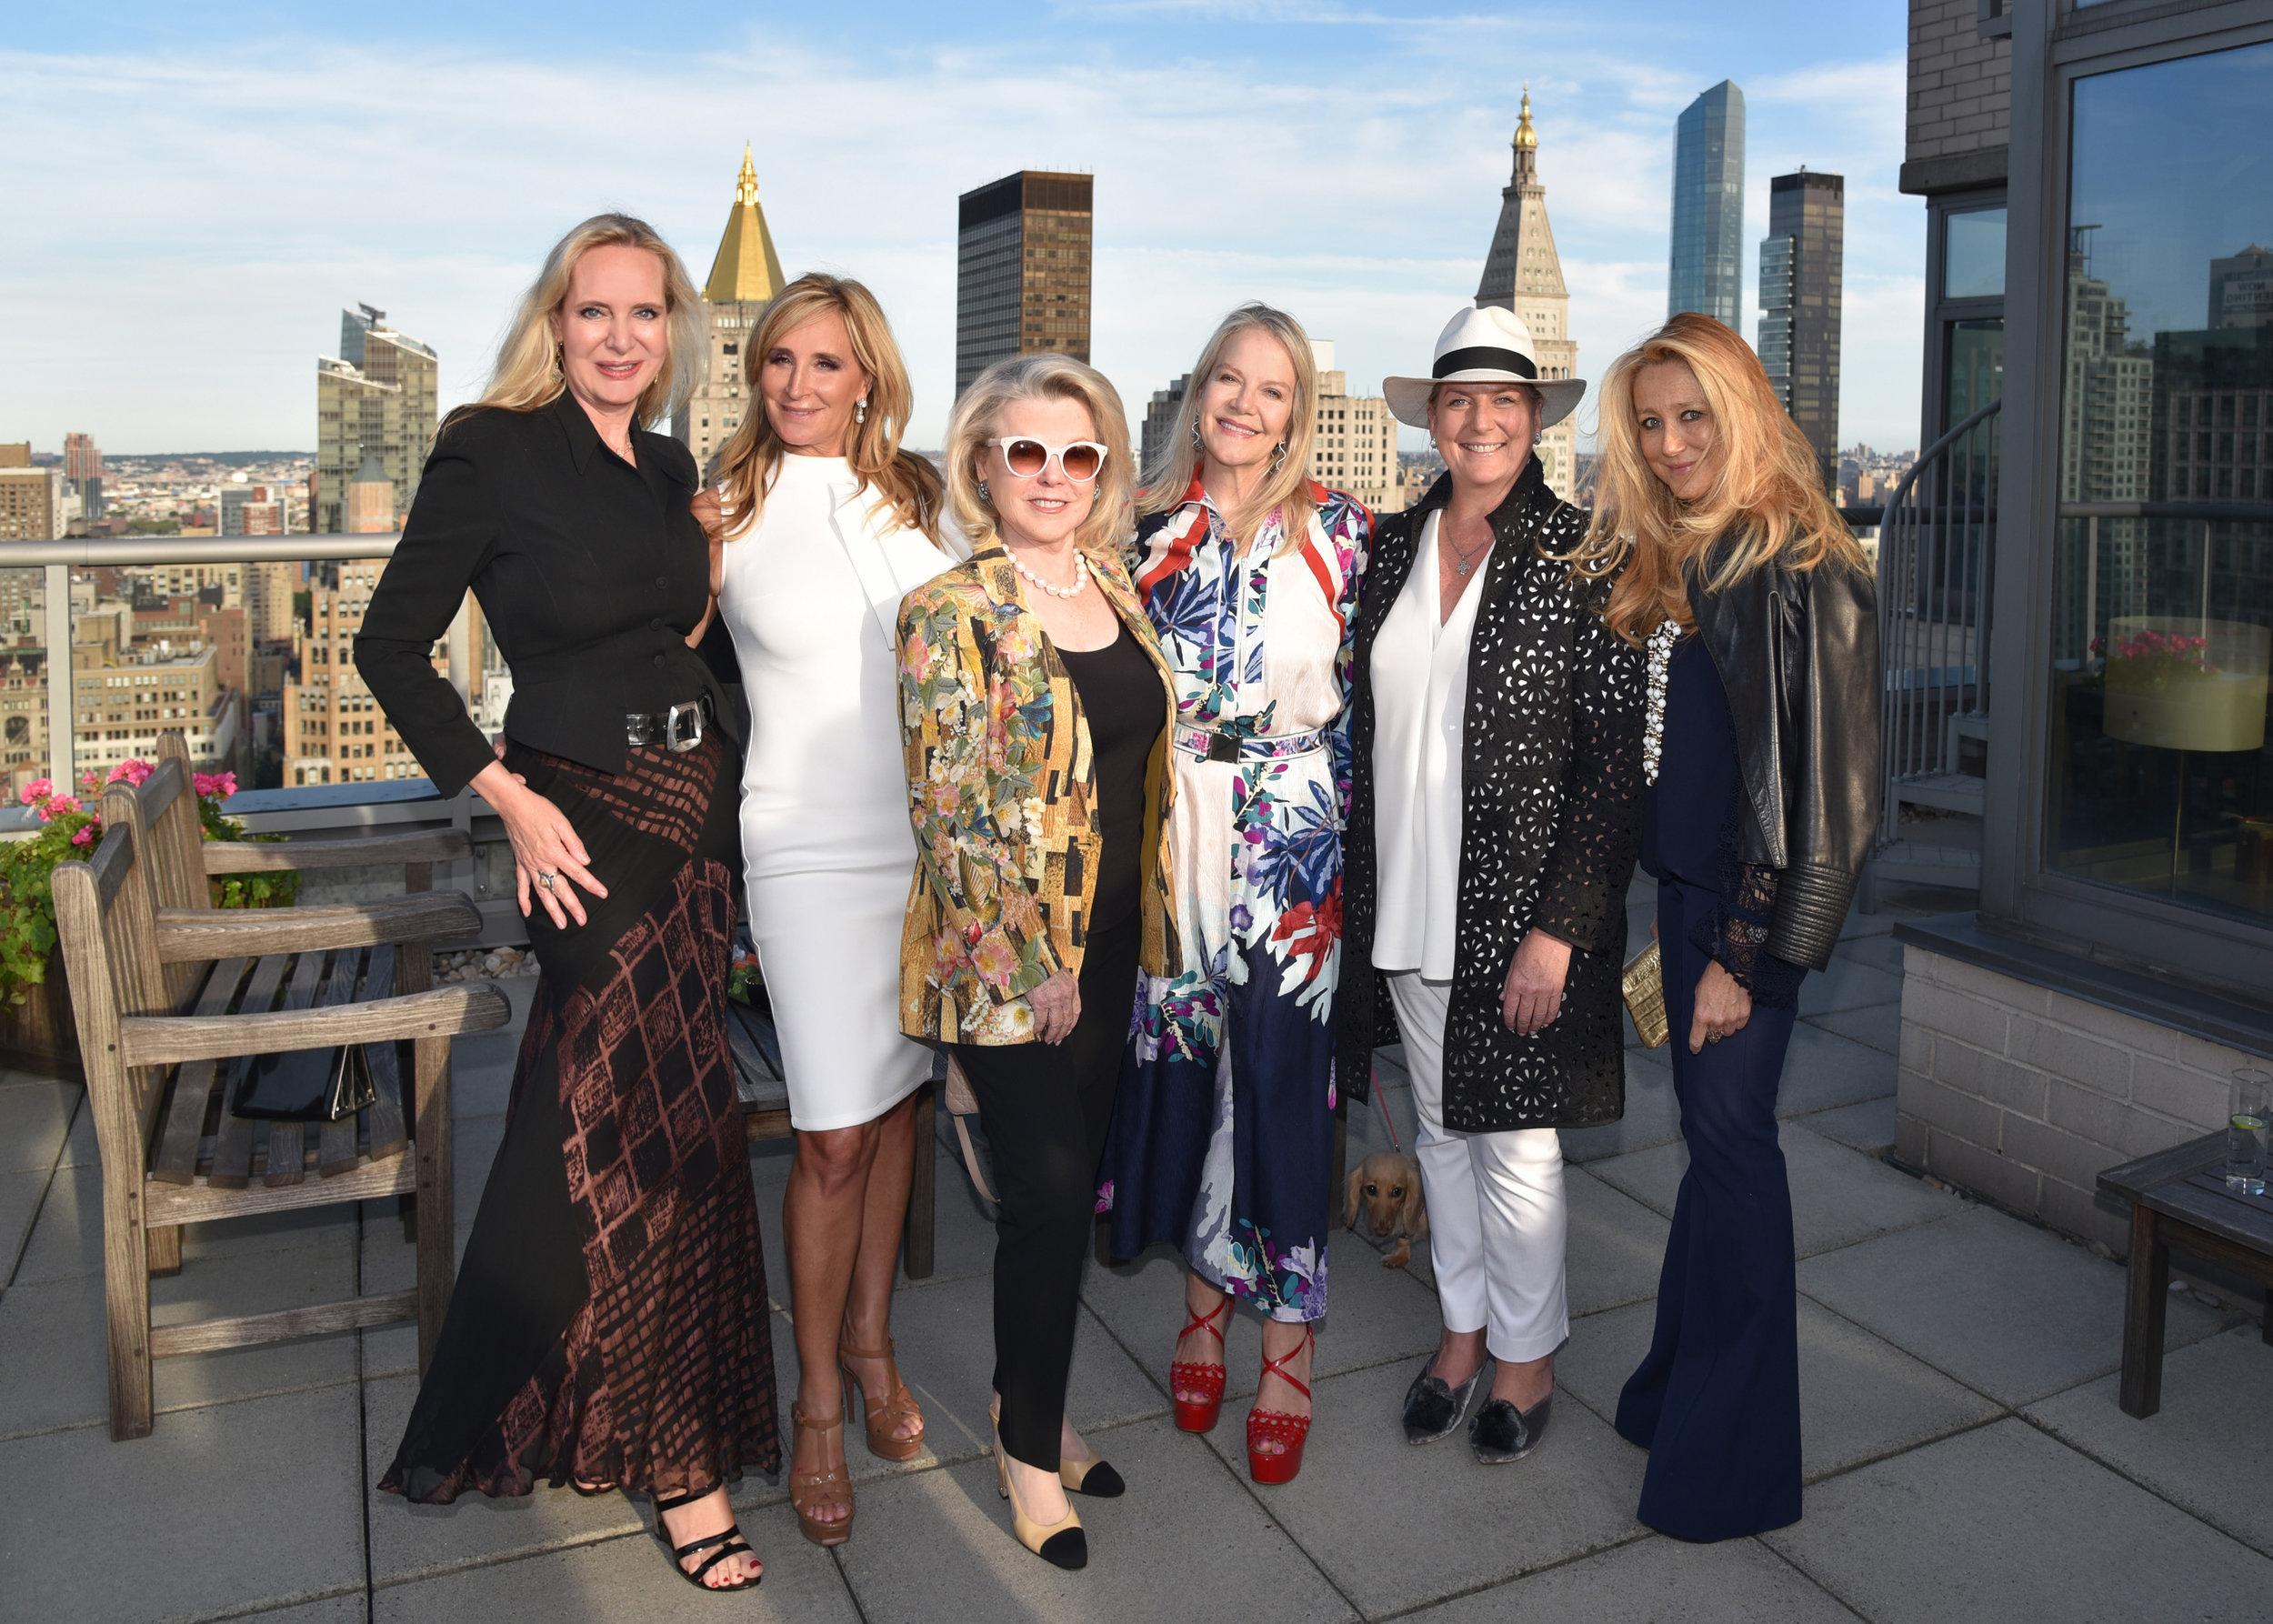 Marie-Claire Gladstone, Sonja Tremont Morgan, Jeanne Lawrence, Pamela Johananoff, Felicia Taylor, and Caroline Berthet